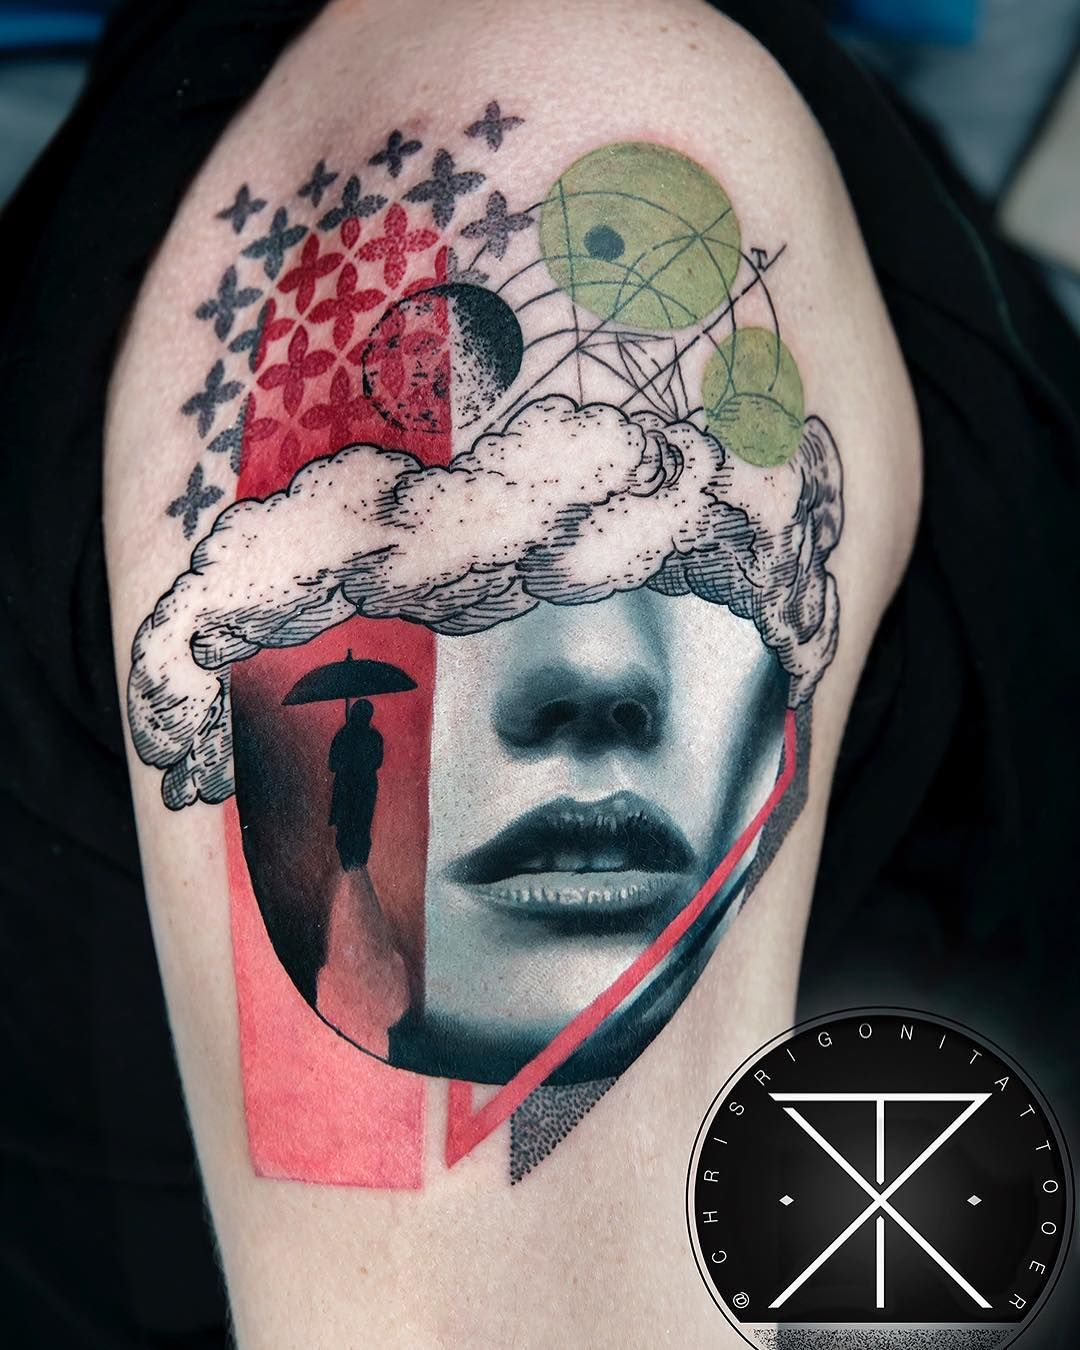 Tattoo by Chris Rigoni Tattooer (chrisrigonitattooer) on